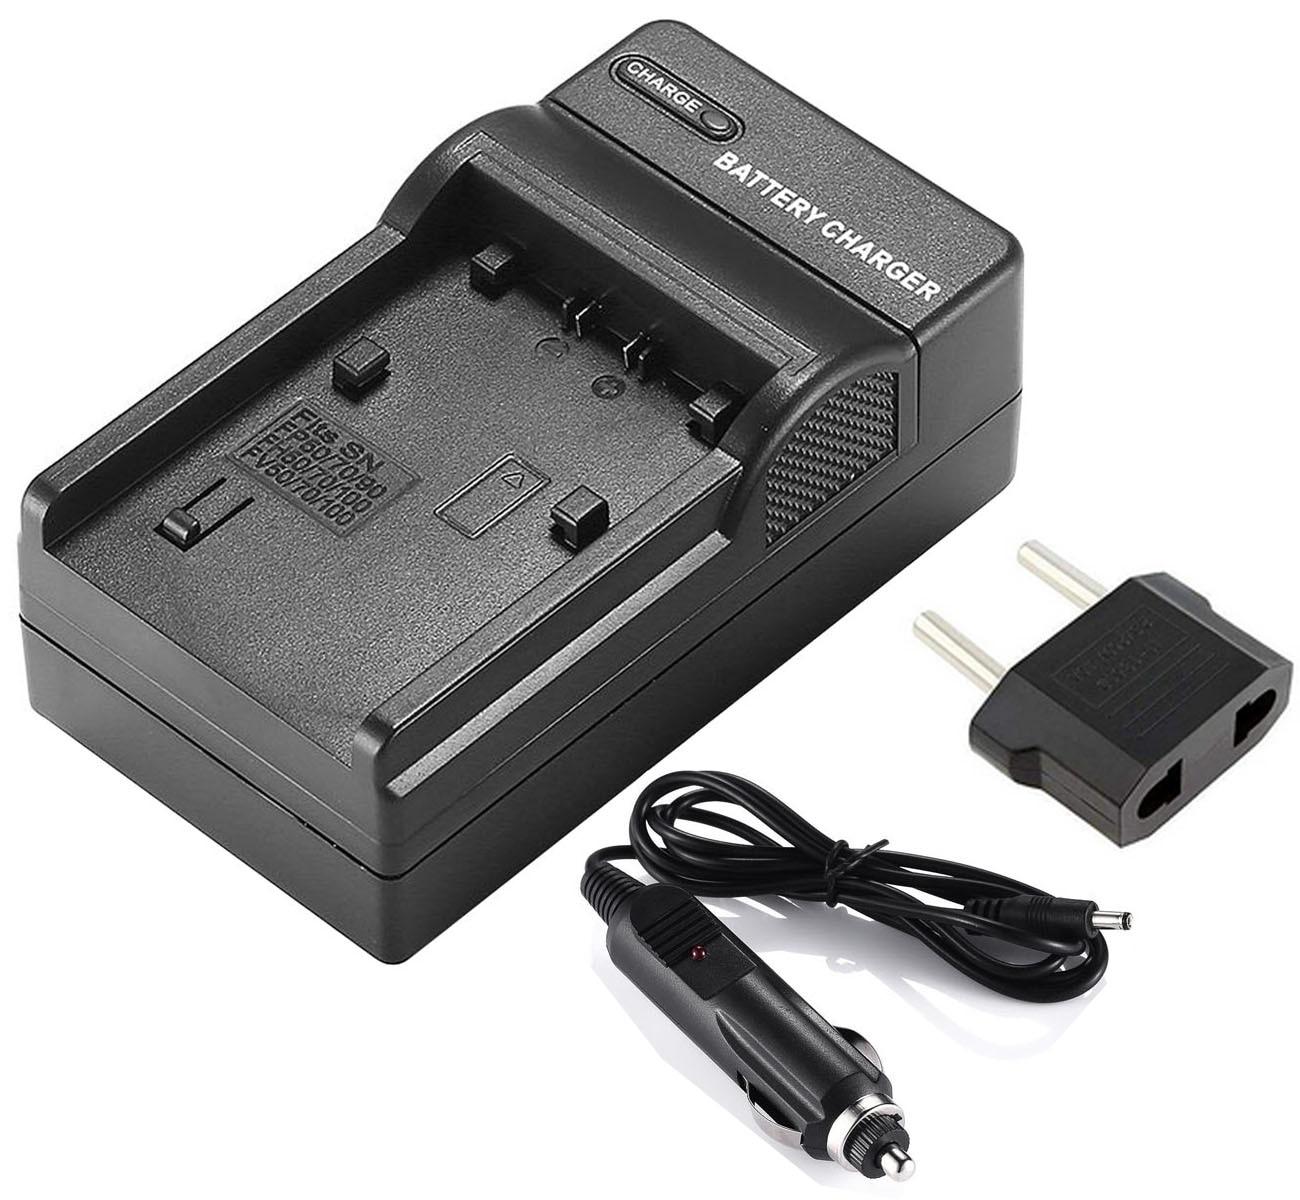 LCD USB Battery Charger for Sony DCR-DVD105 DCR-DVD305 DCR-DVD405 DCR-DVD205 DCR-DVD505 Handycam Camcorder